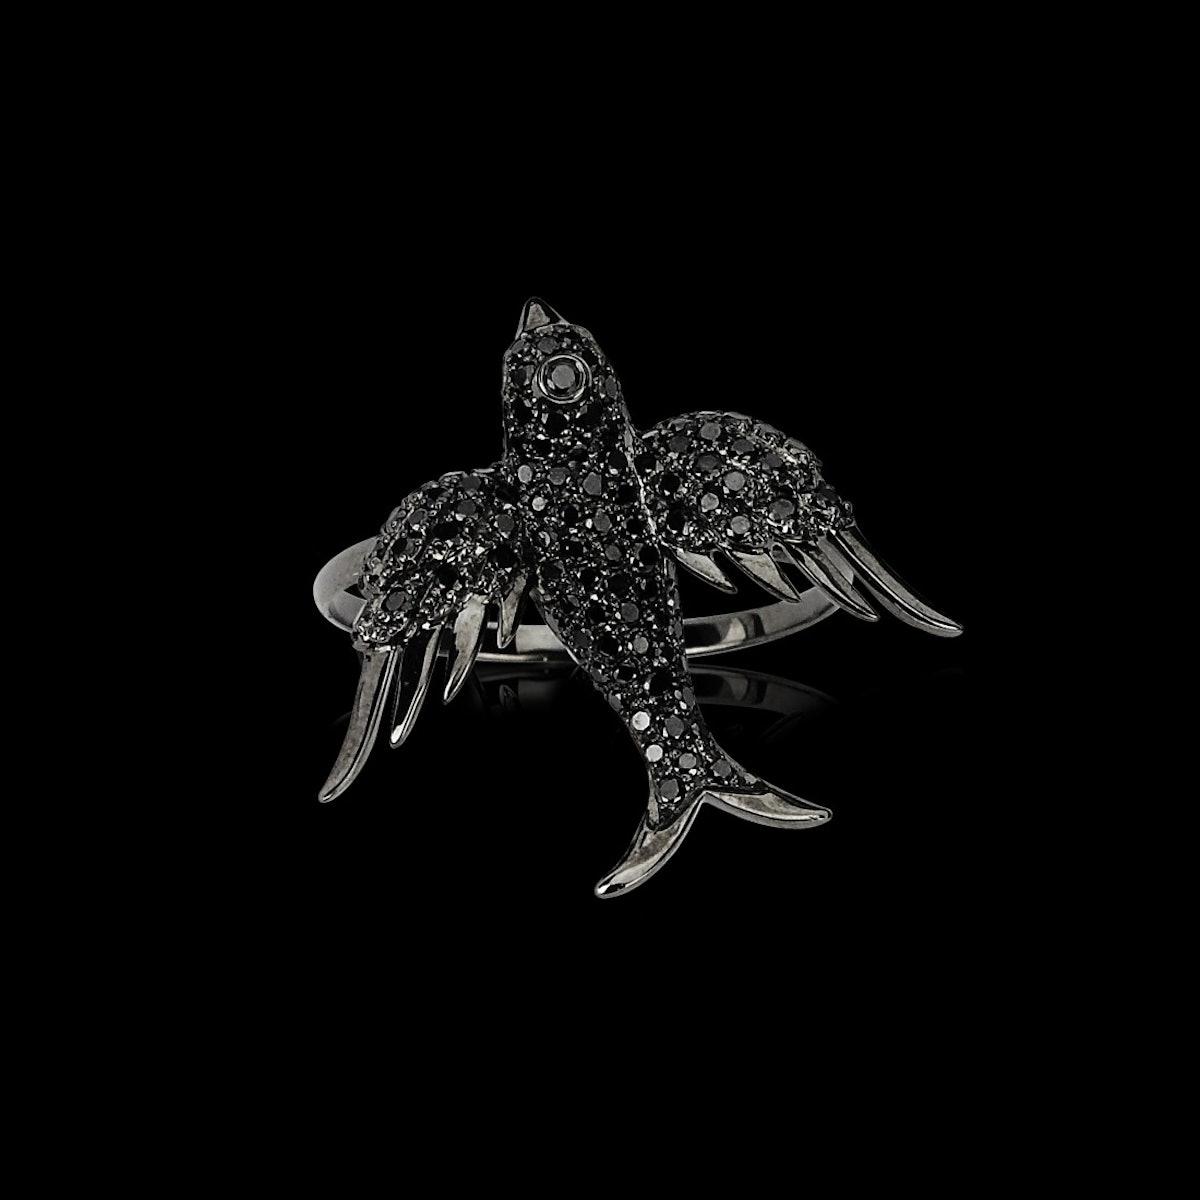 Colette Black Rize ring